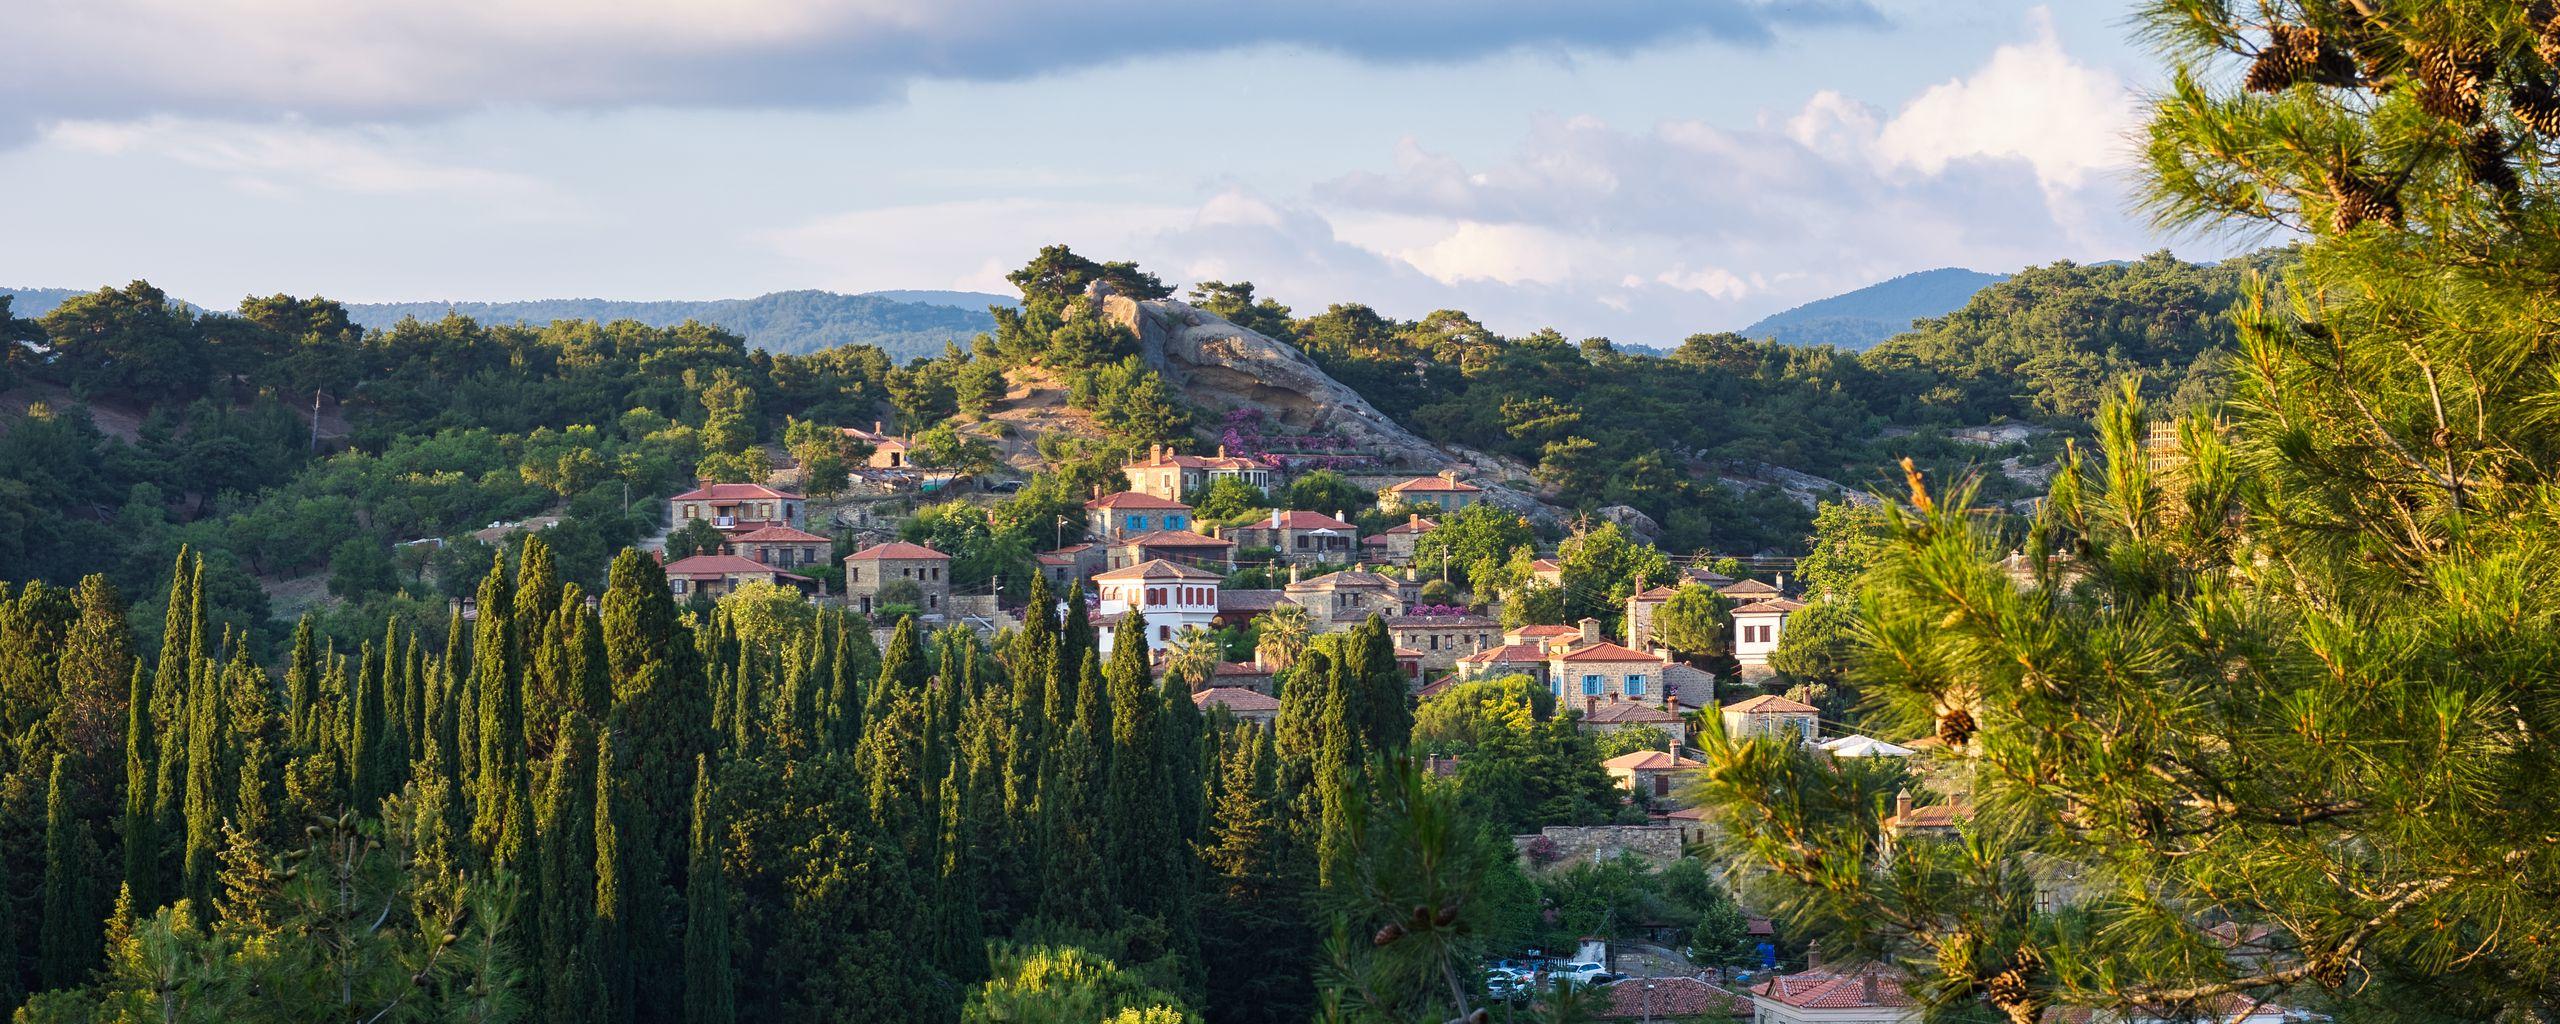 2560x1024 Wallpaper village, mountain, buildings, trees